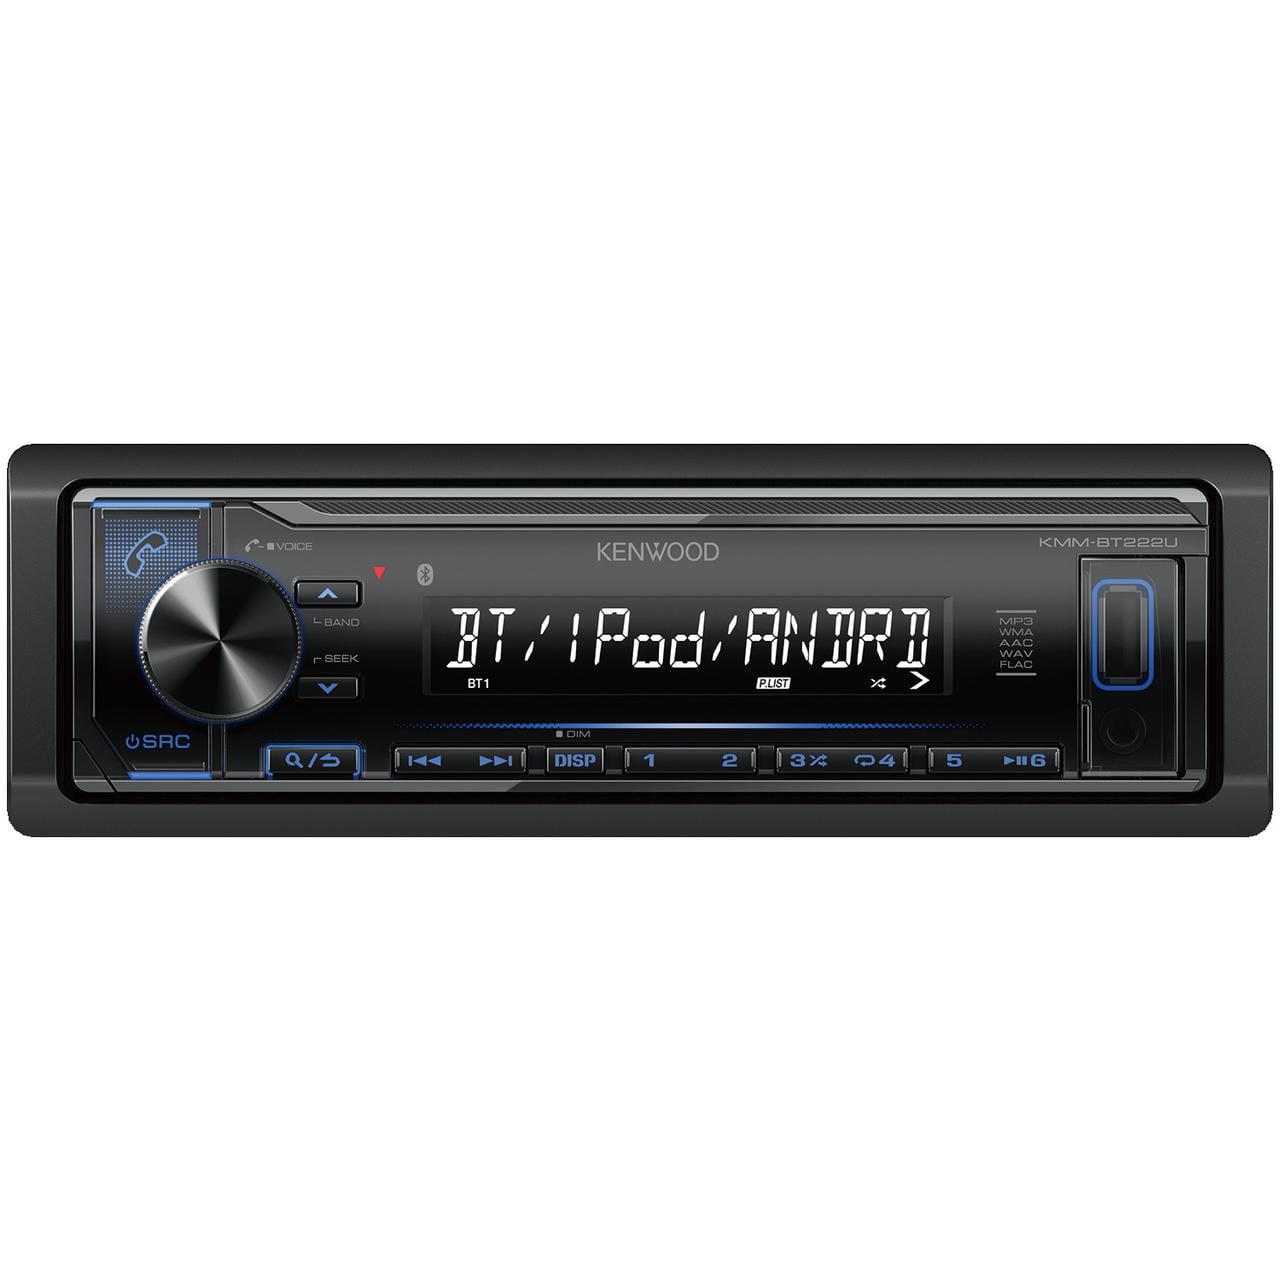 Kenwood KMM-BT222U Single-Din In-Dash Digital Media Receiver With Bluetooth by Kenwood